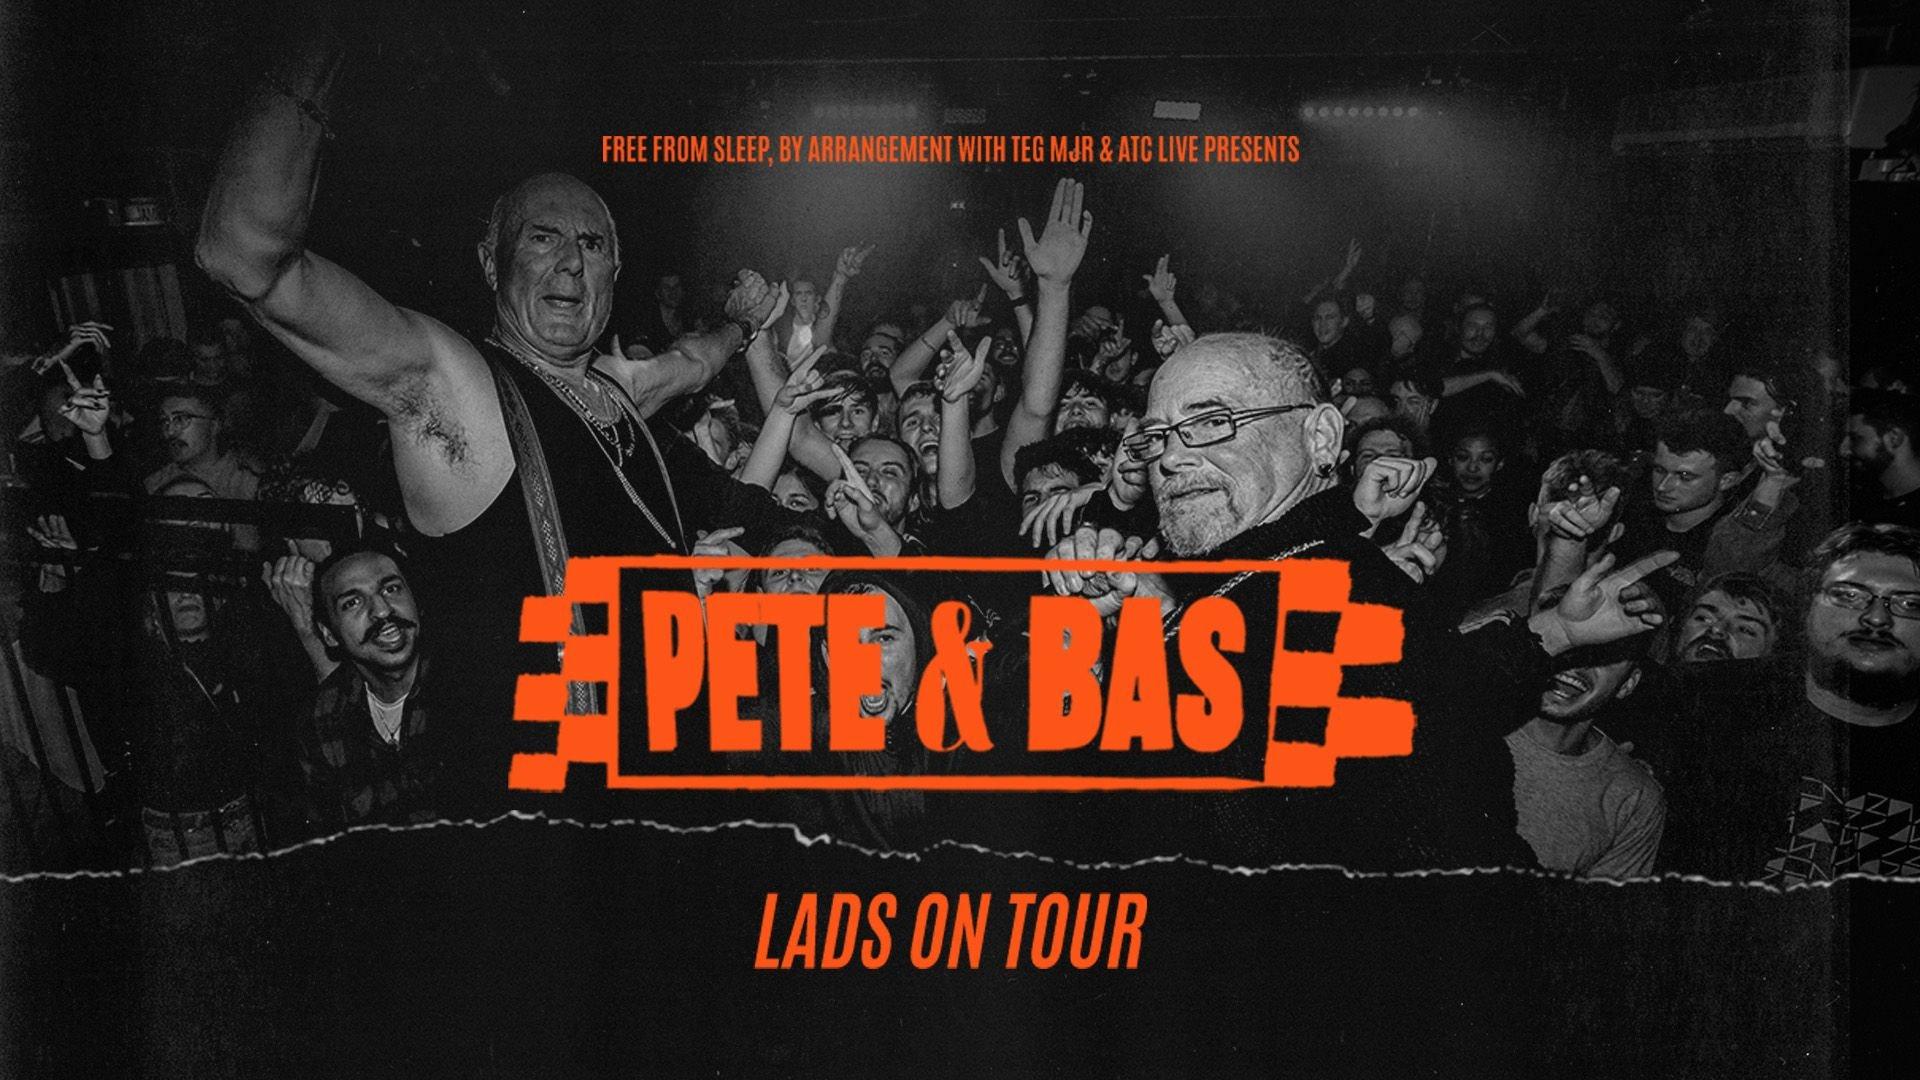 Pete & Bas – Live